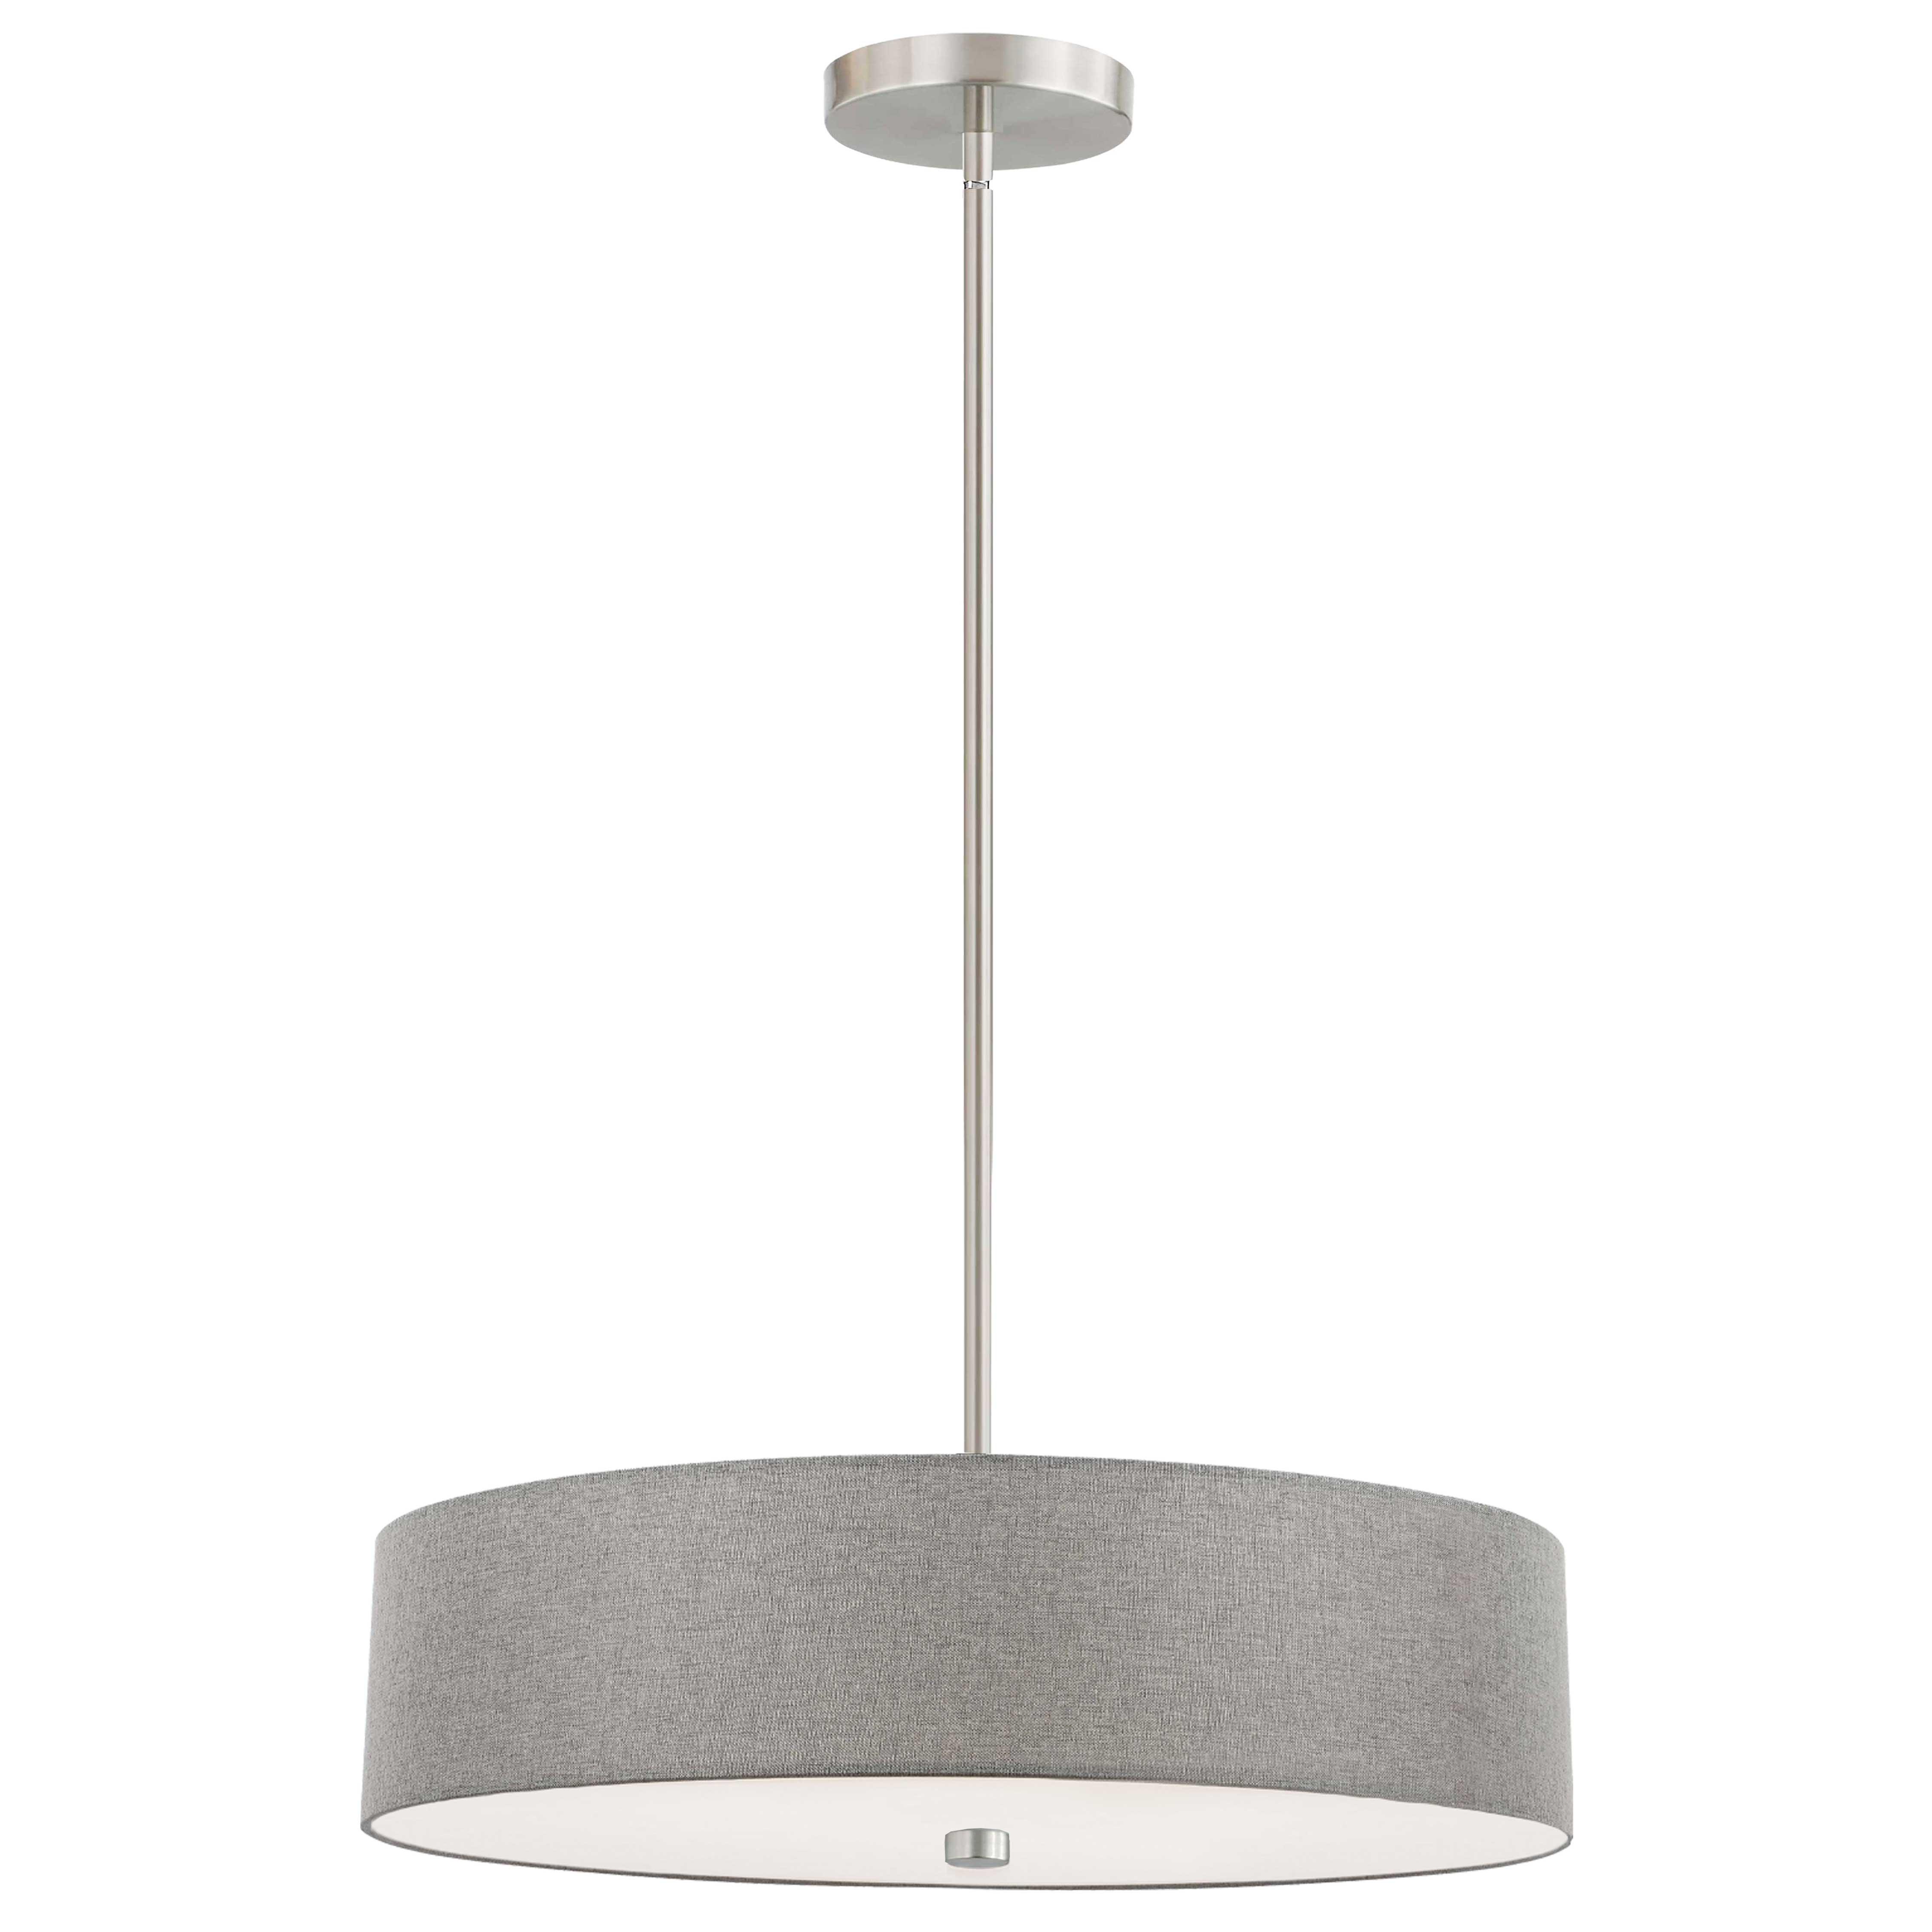 4 Light Incandescent Pendant Satin Chrome with Grey Shade